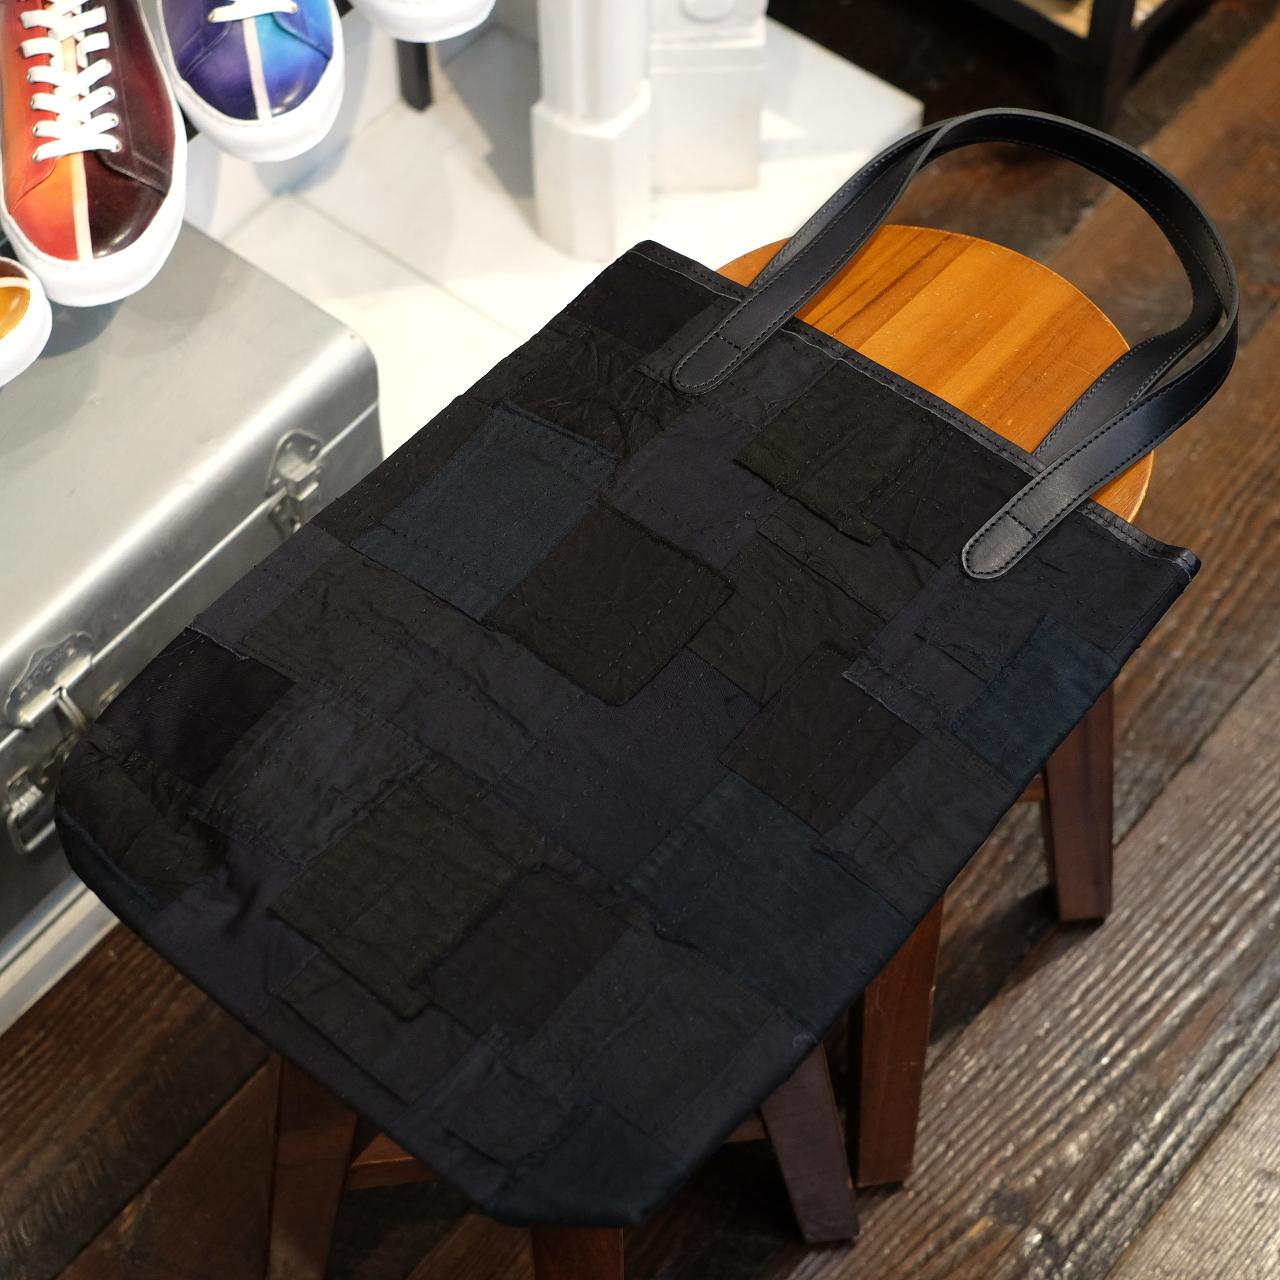 KUON(クオン) アップサイクルブラック シンプルトートバッグ